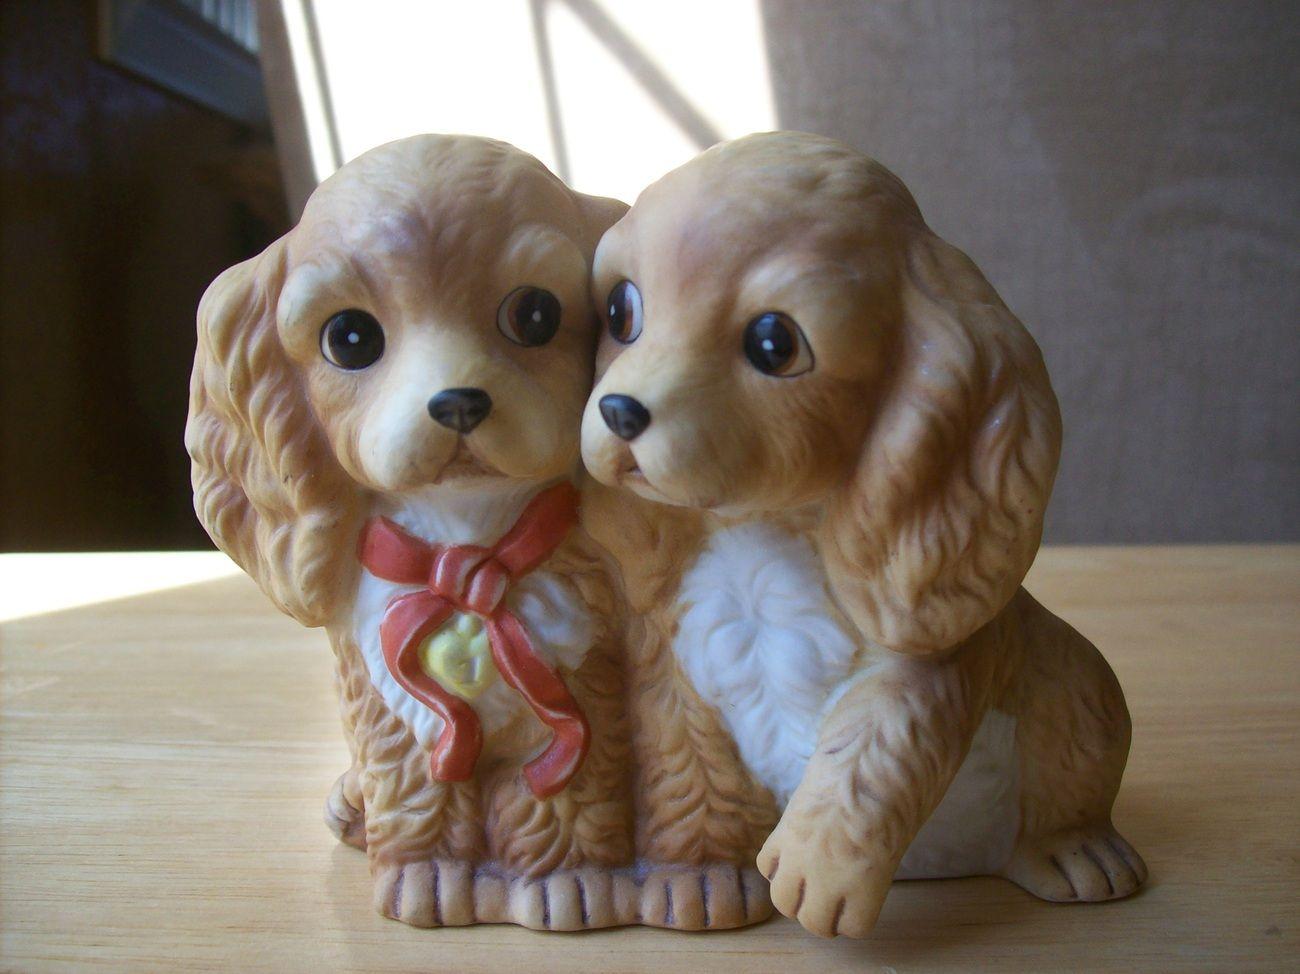 Home interior masterpiece figurines  homco masterpiece porcelain puppies figurine